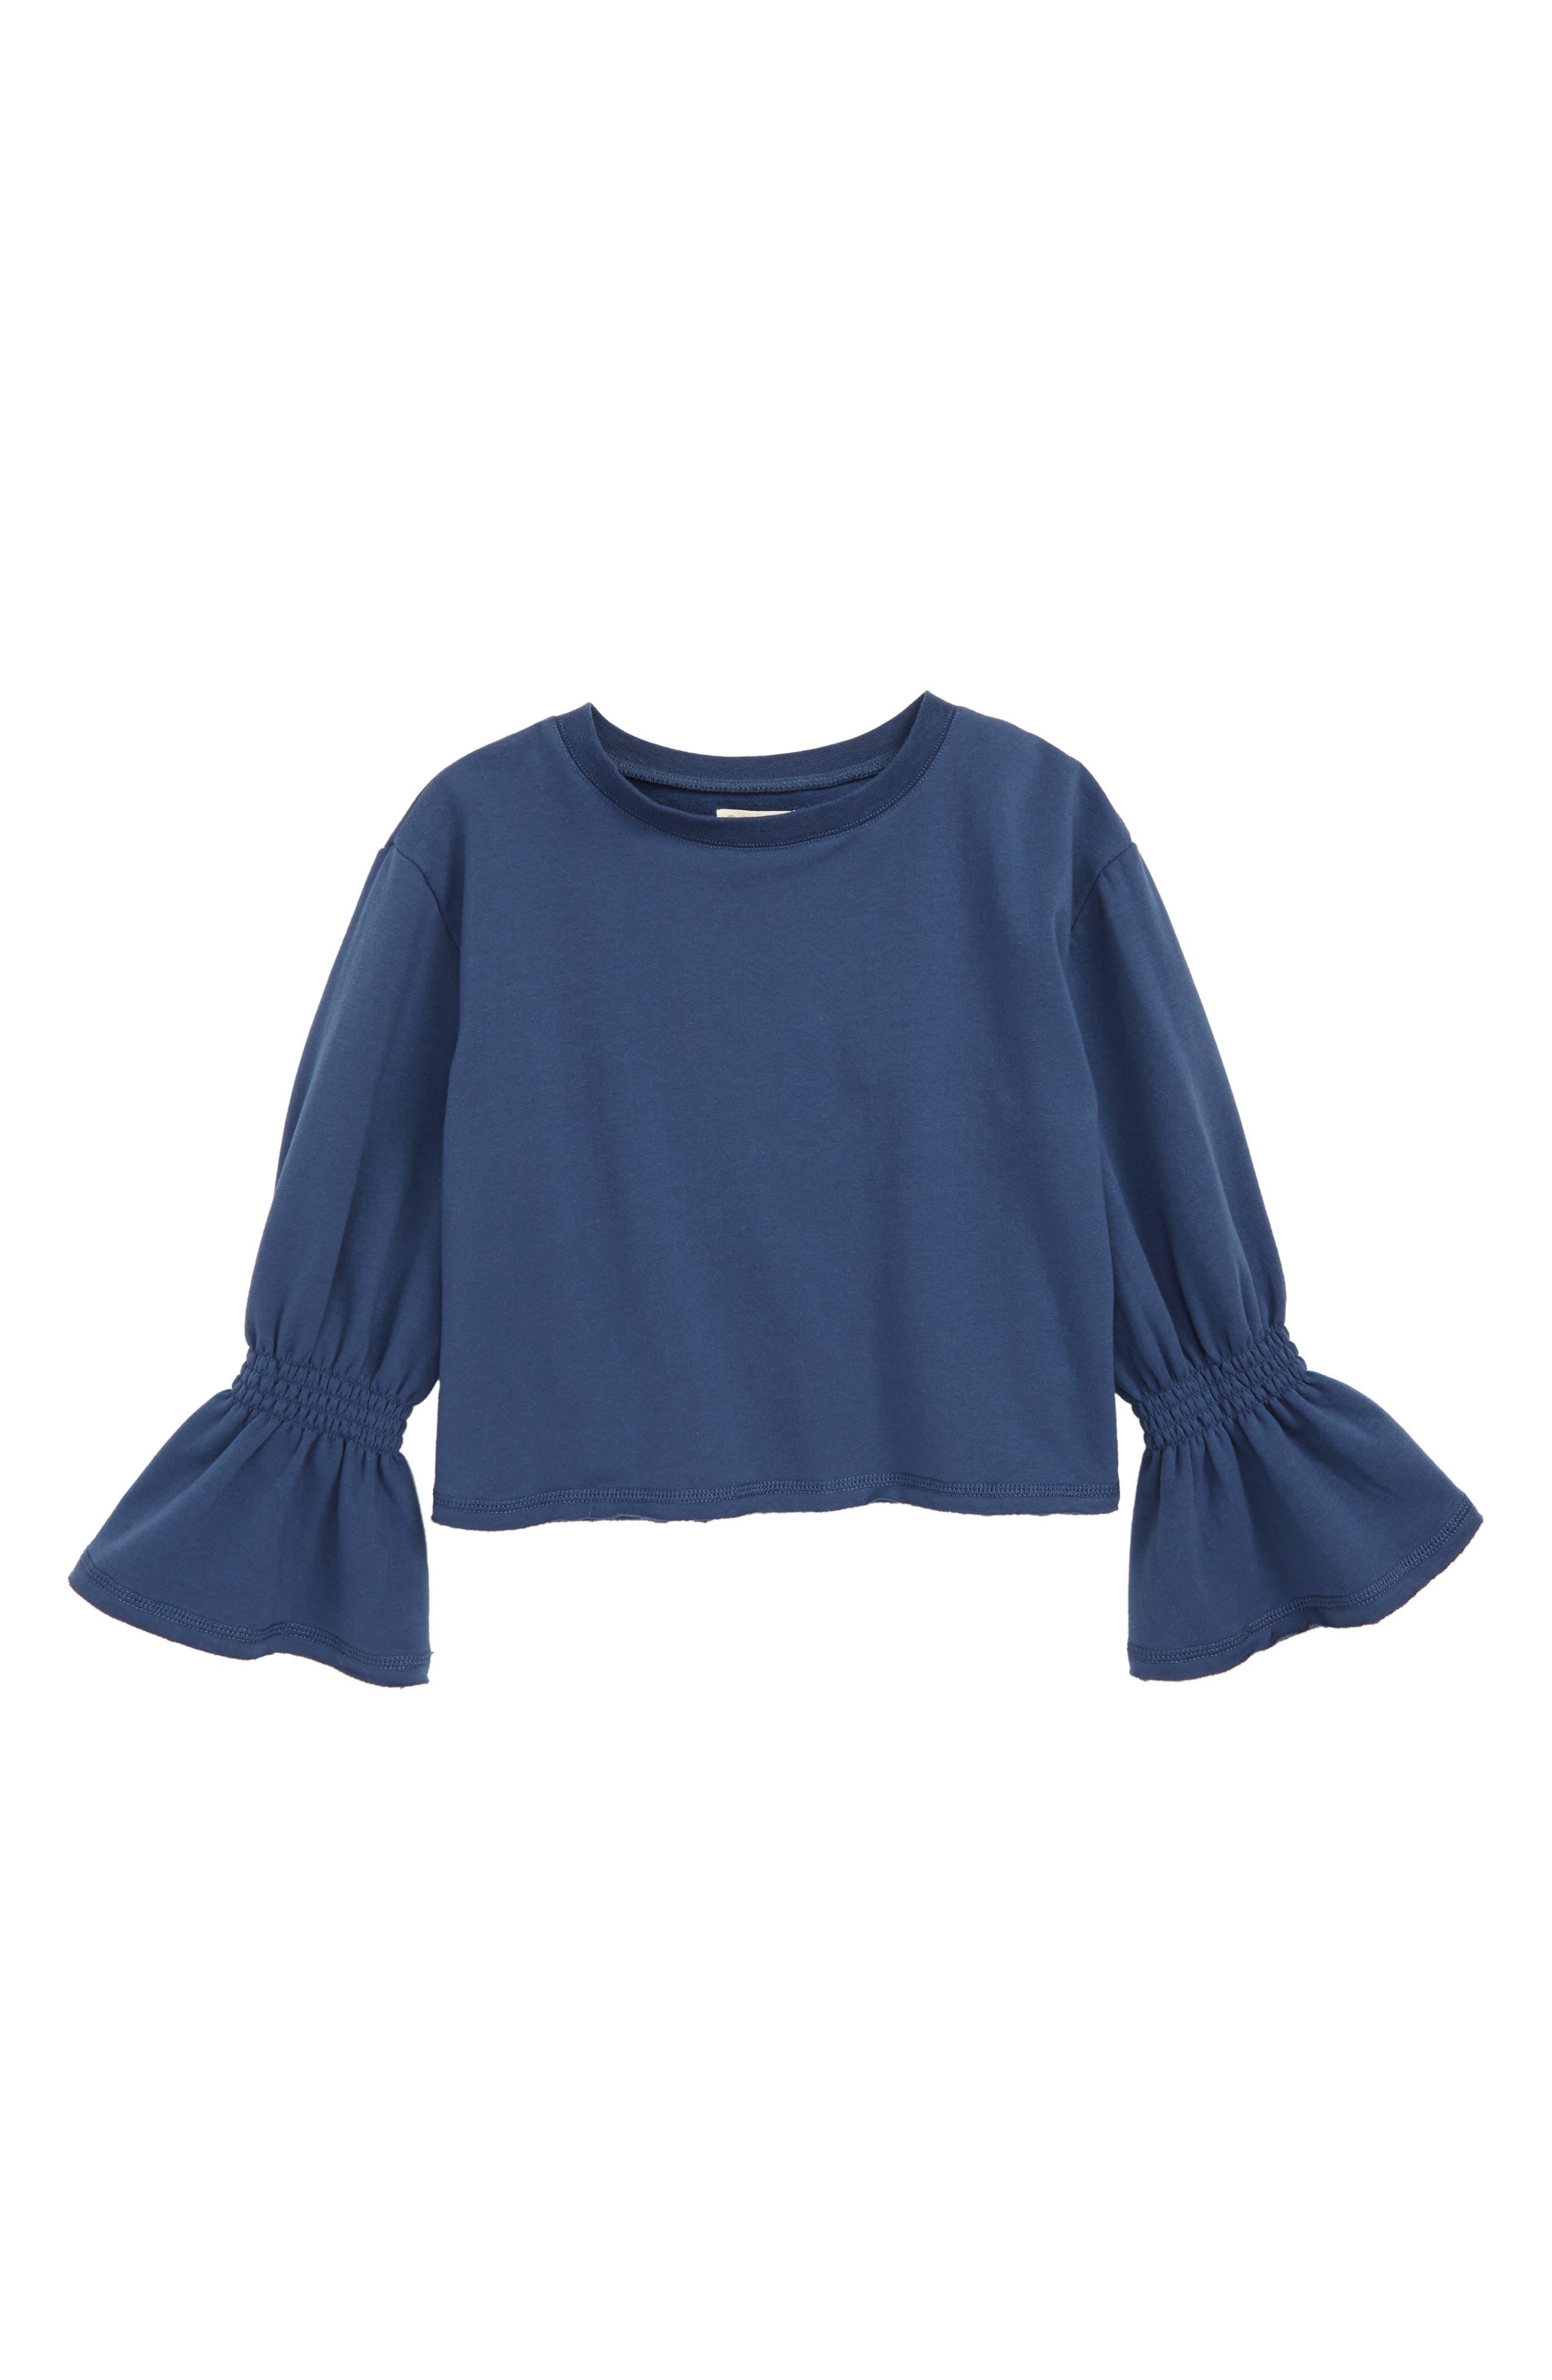 Fleece Flare Sleeve Top, Main, color, NAVY DENIM